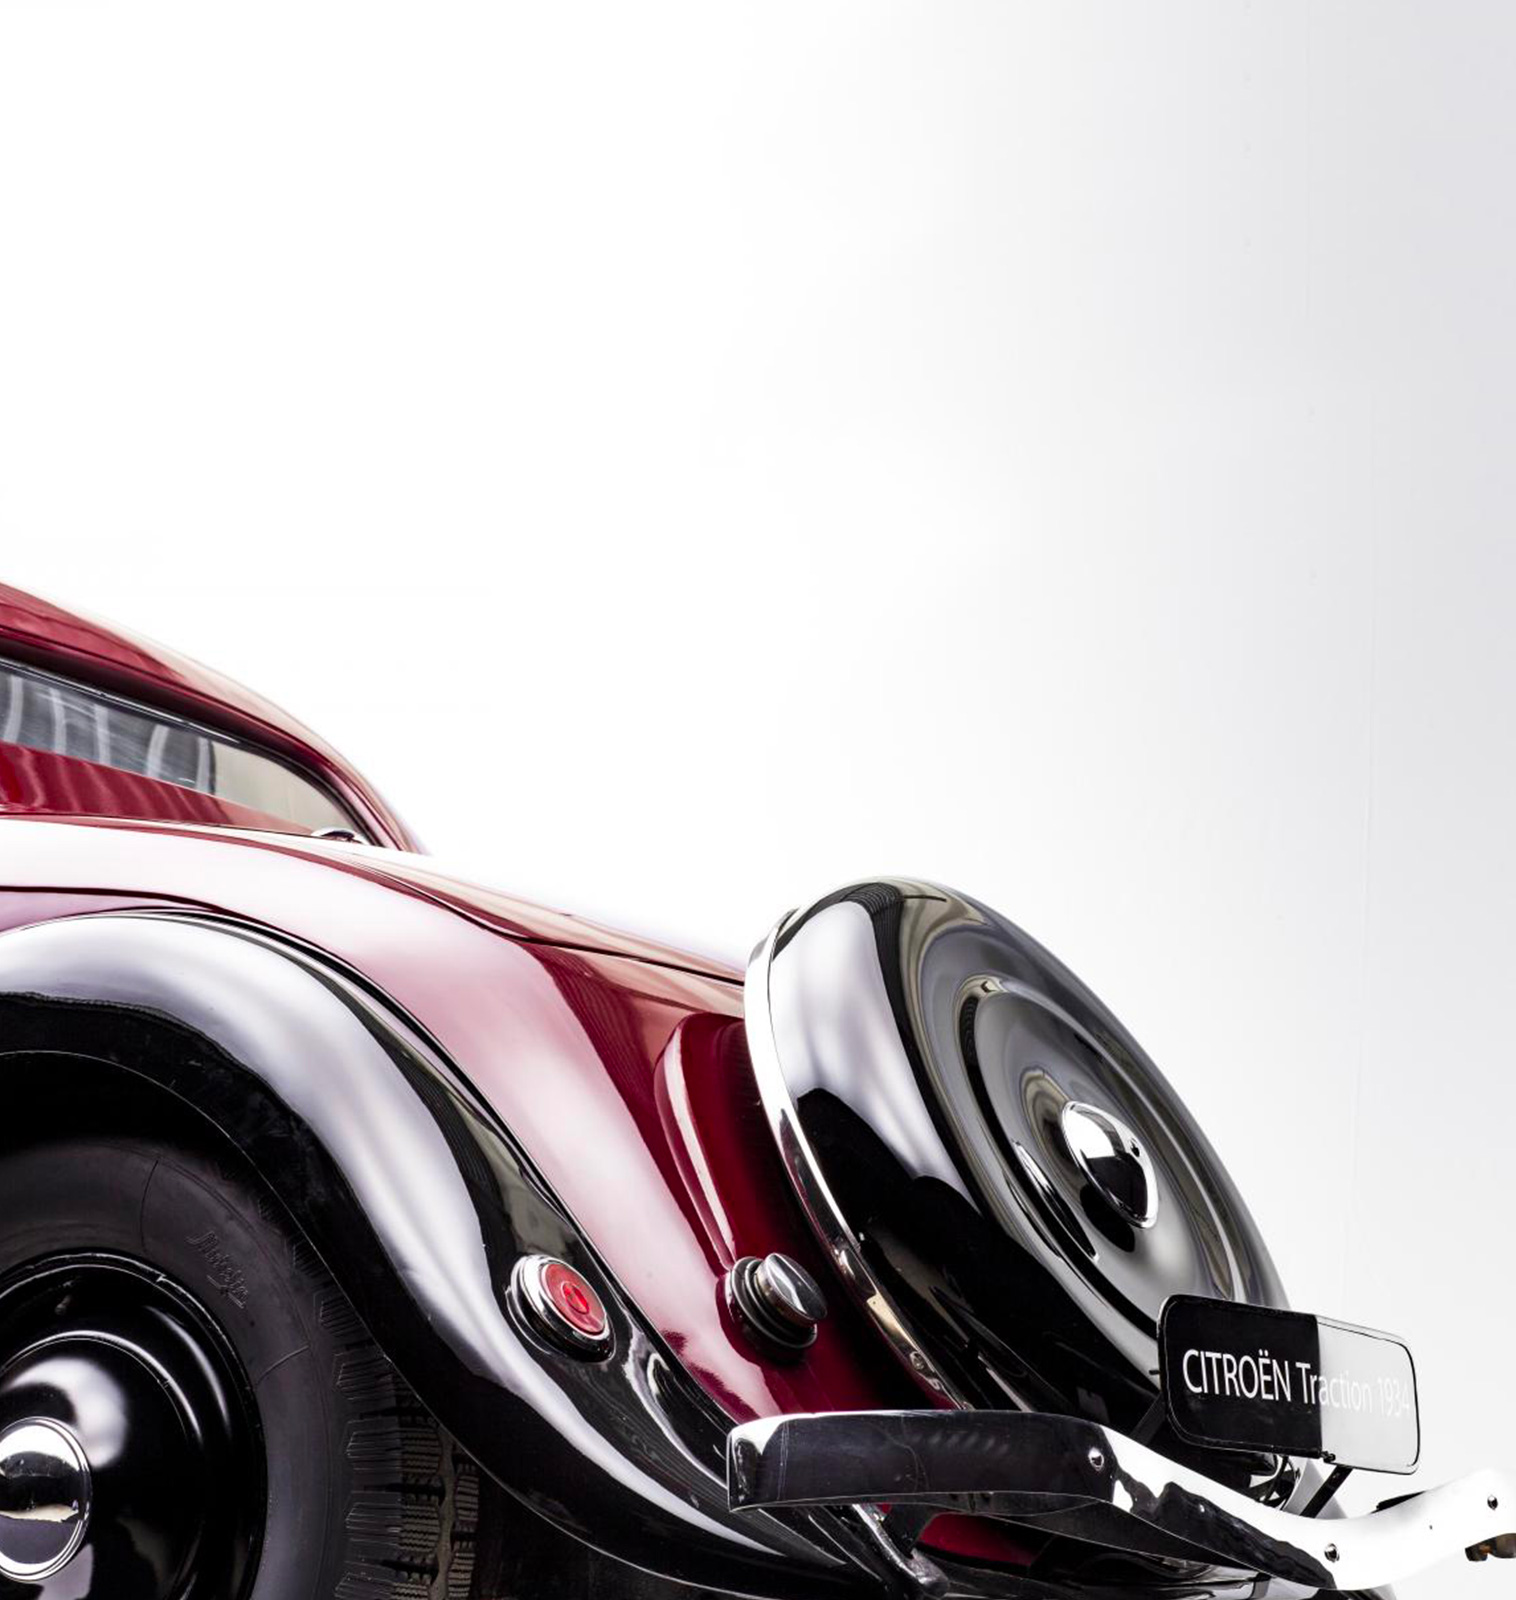 Citroën™ Origins